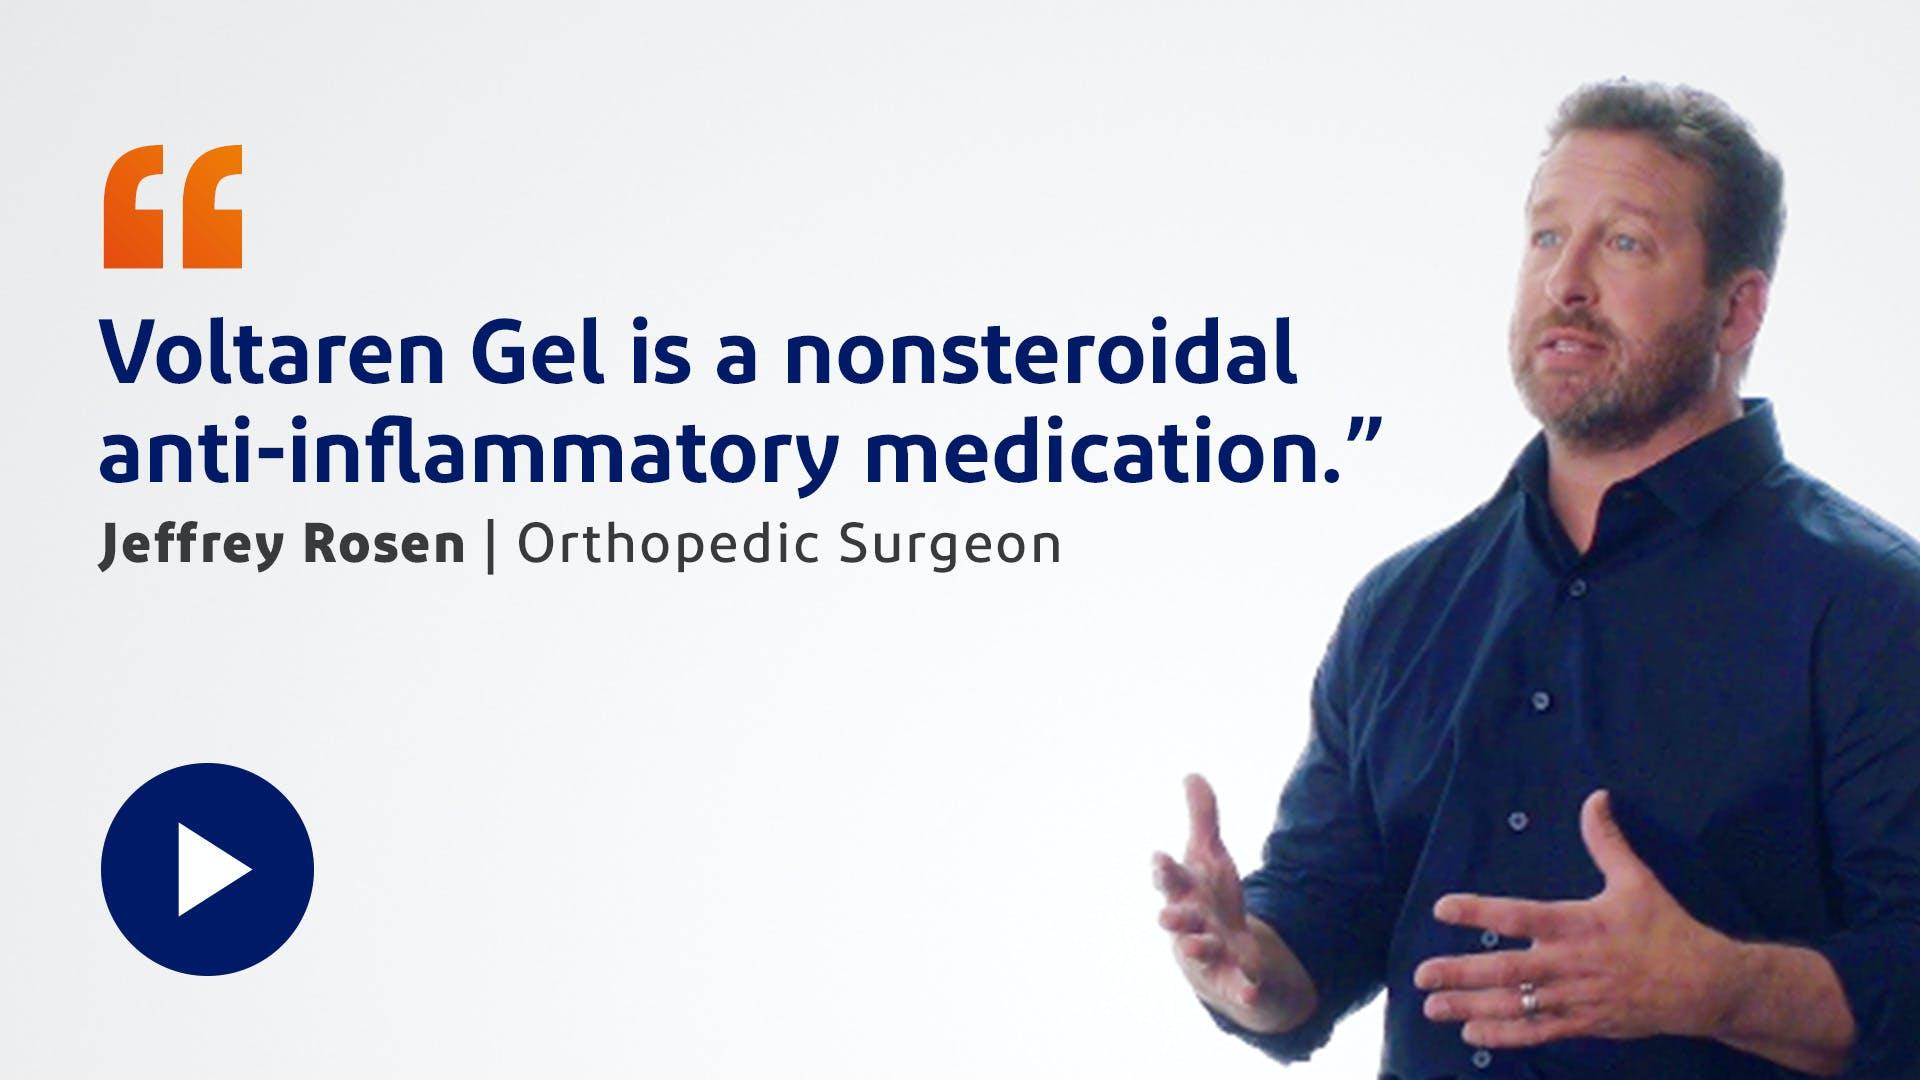 Dr. Rosen Prescribes Voltaren Gel Video